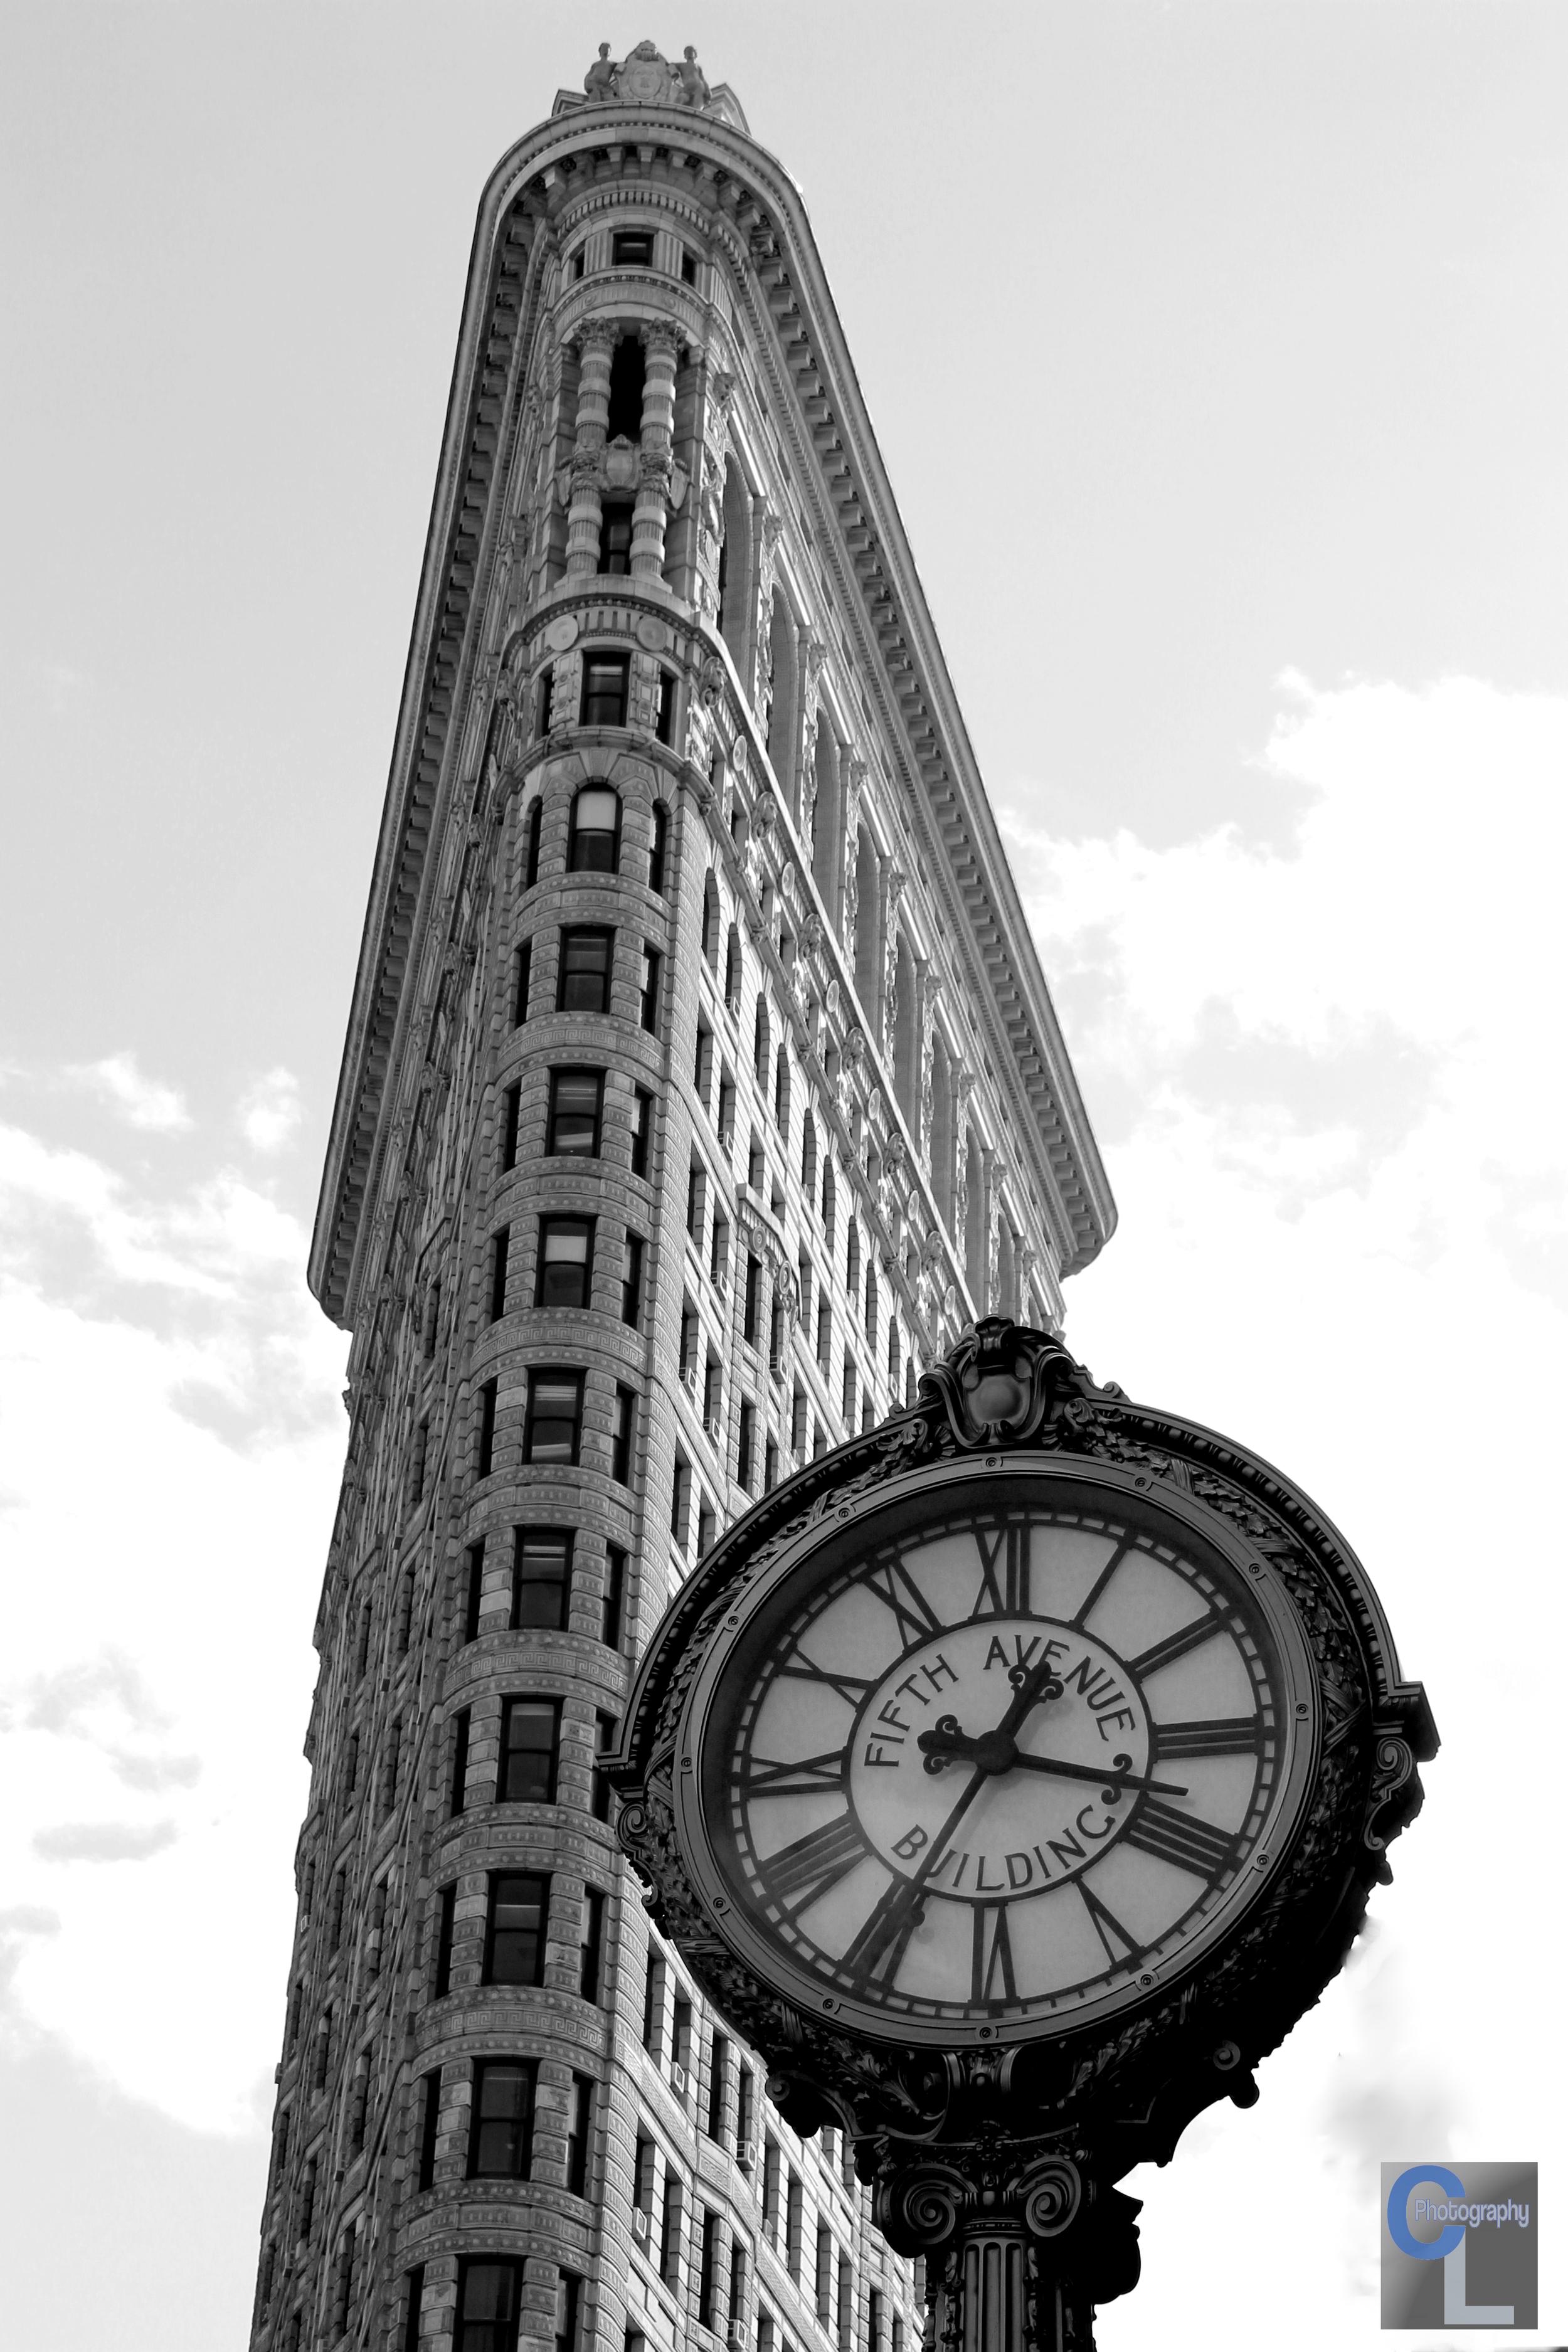 IMG_8872 5thave building clock CLP.JPG